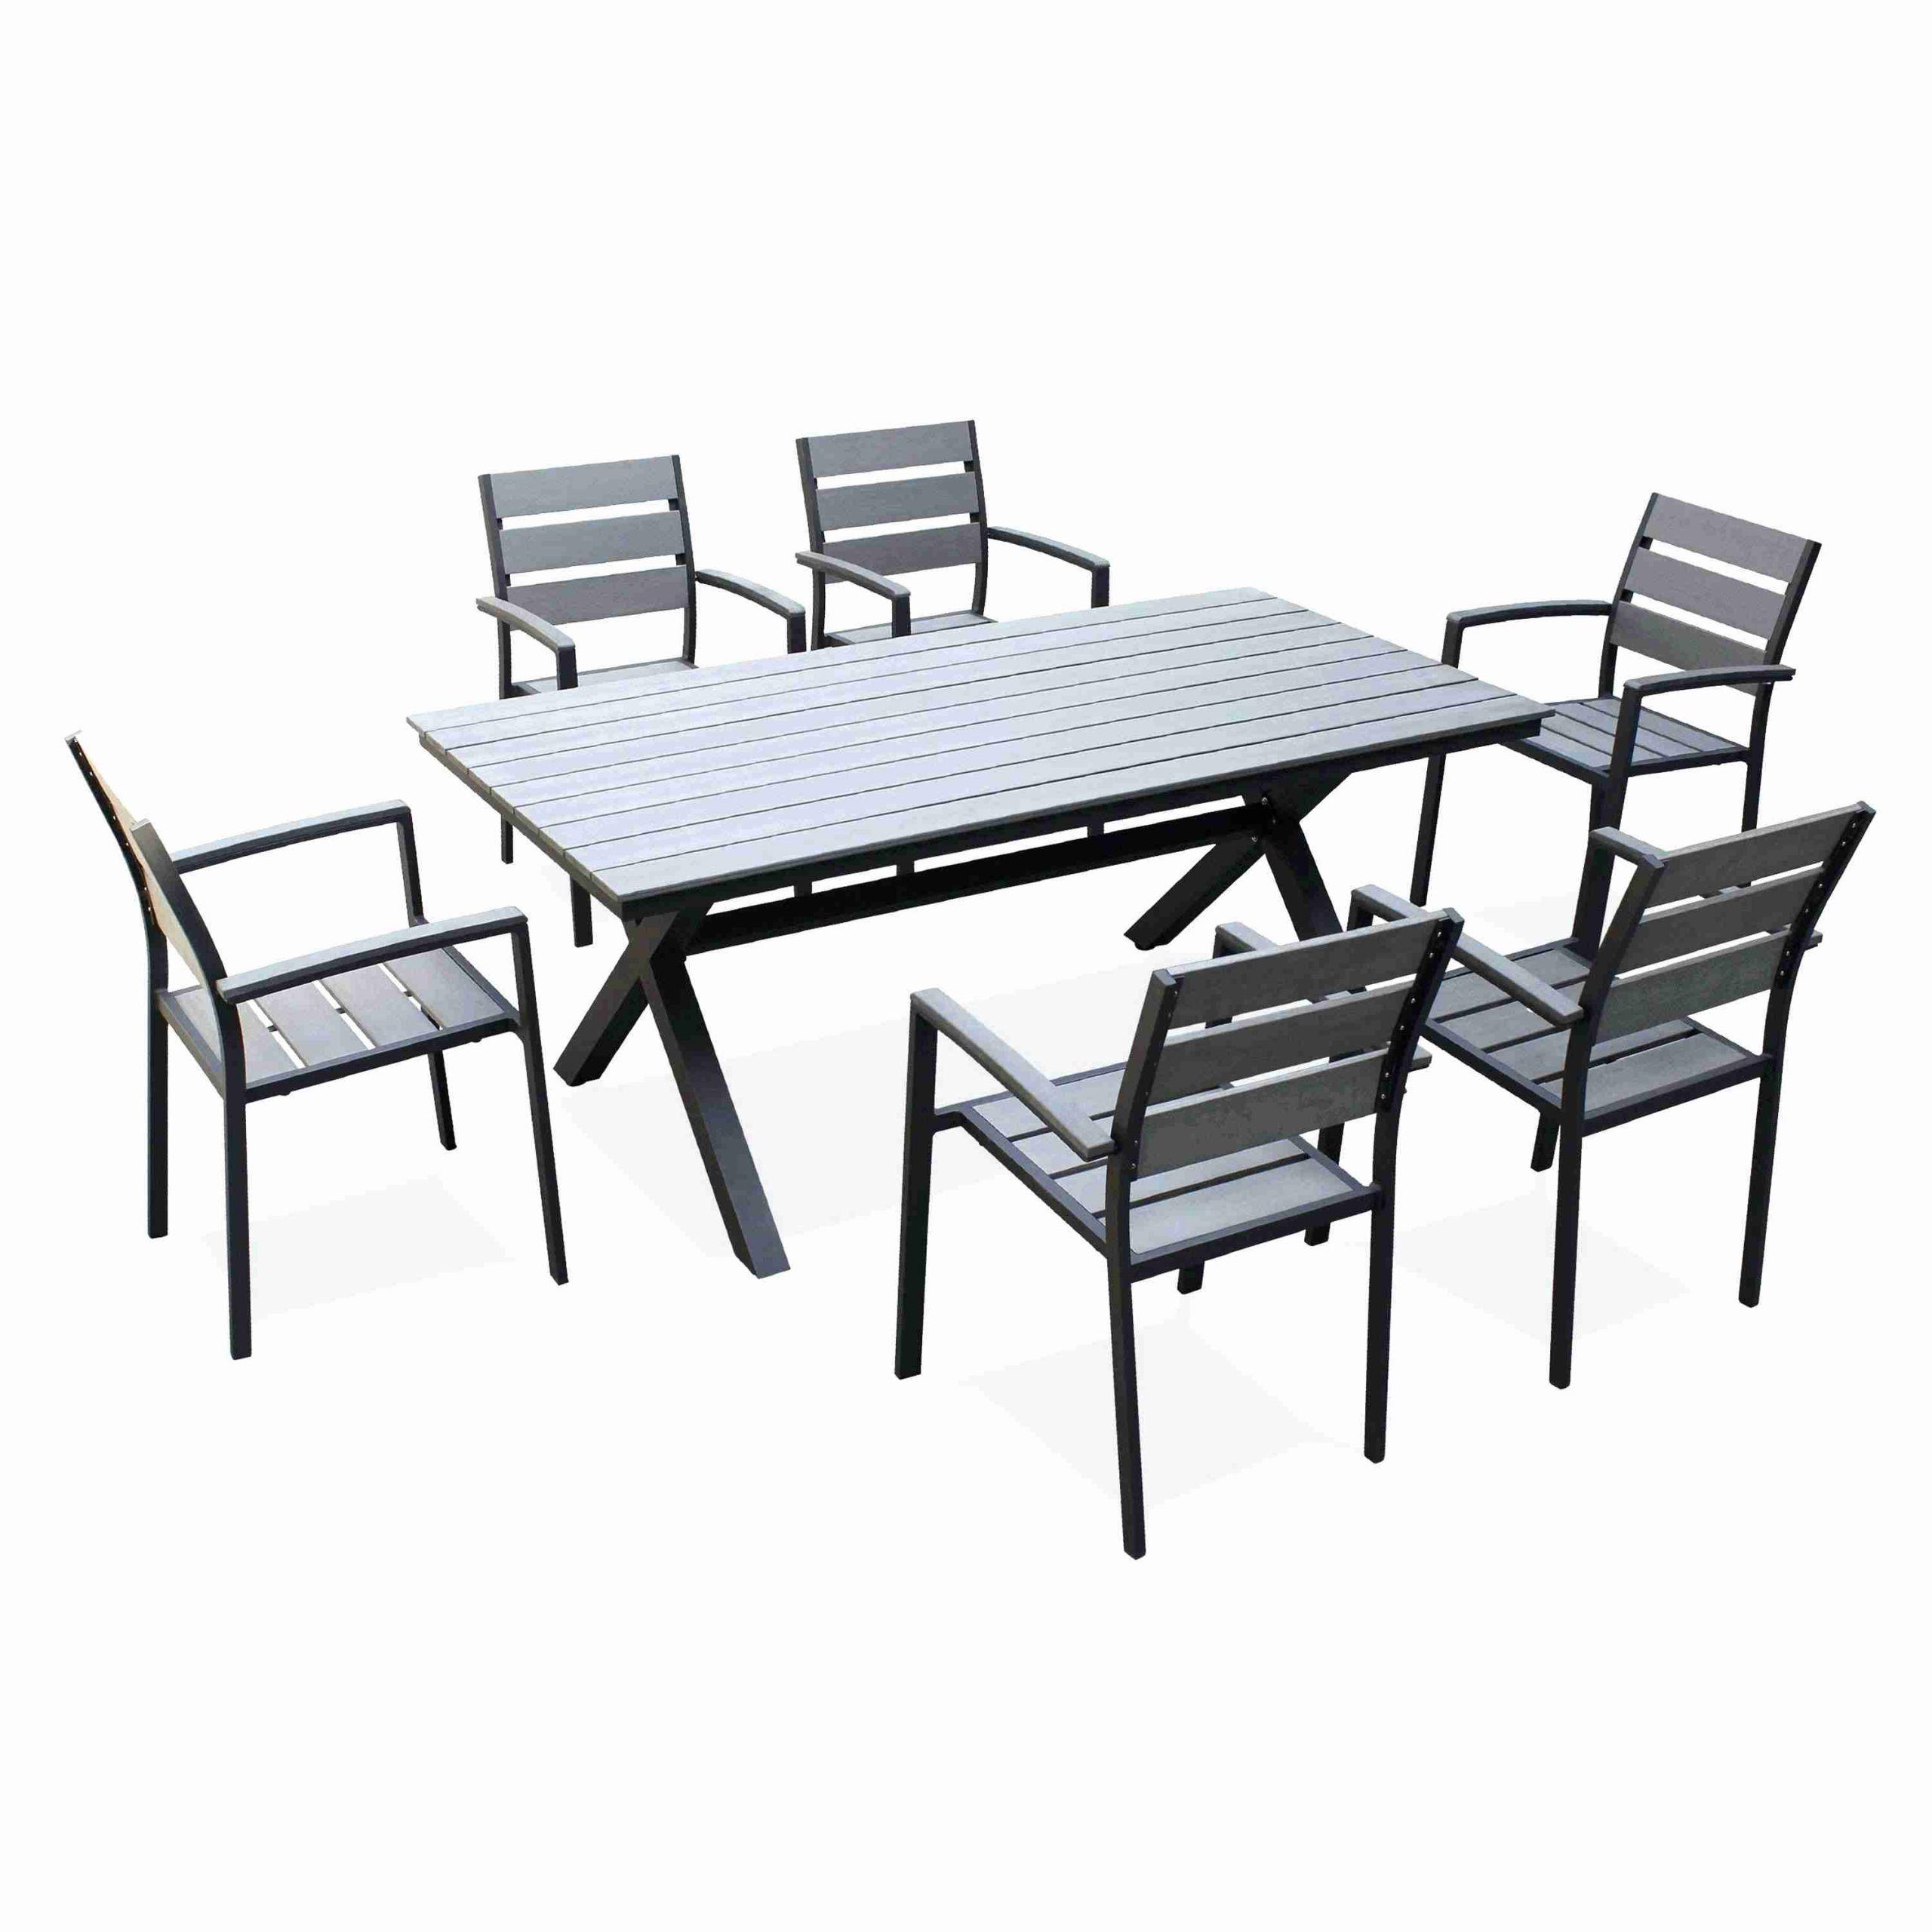 joli salon de jardin aluminium chaise bistro fermob meilleur interesting hesperide of